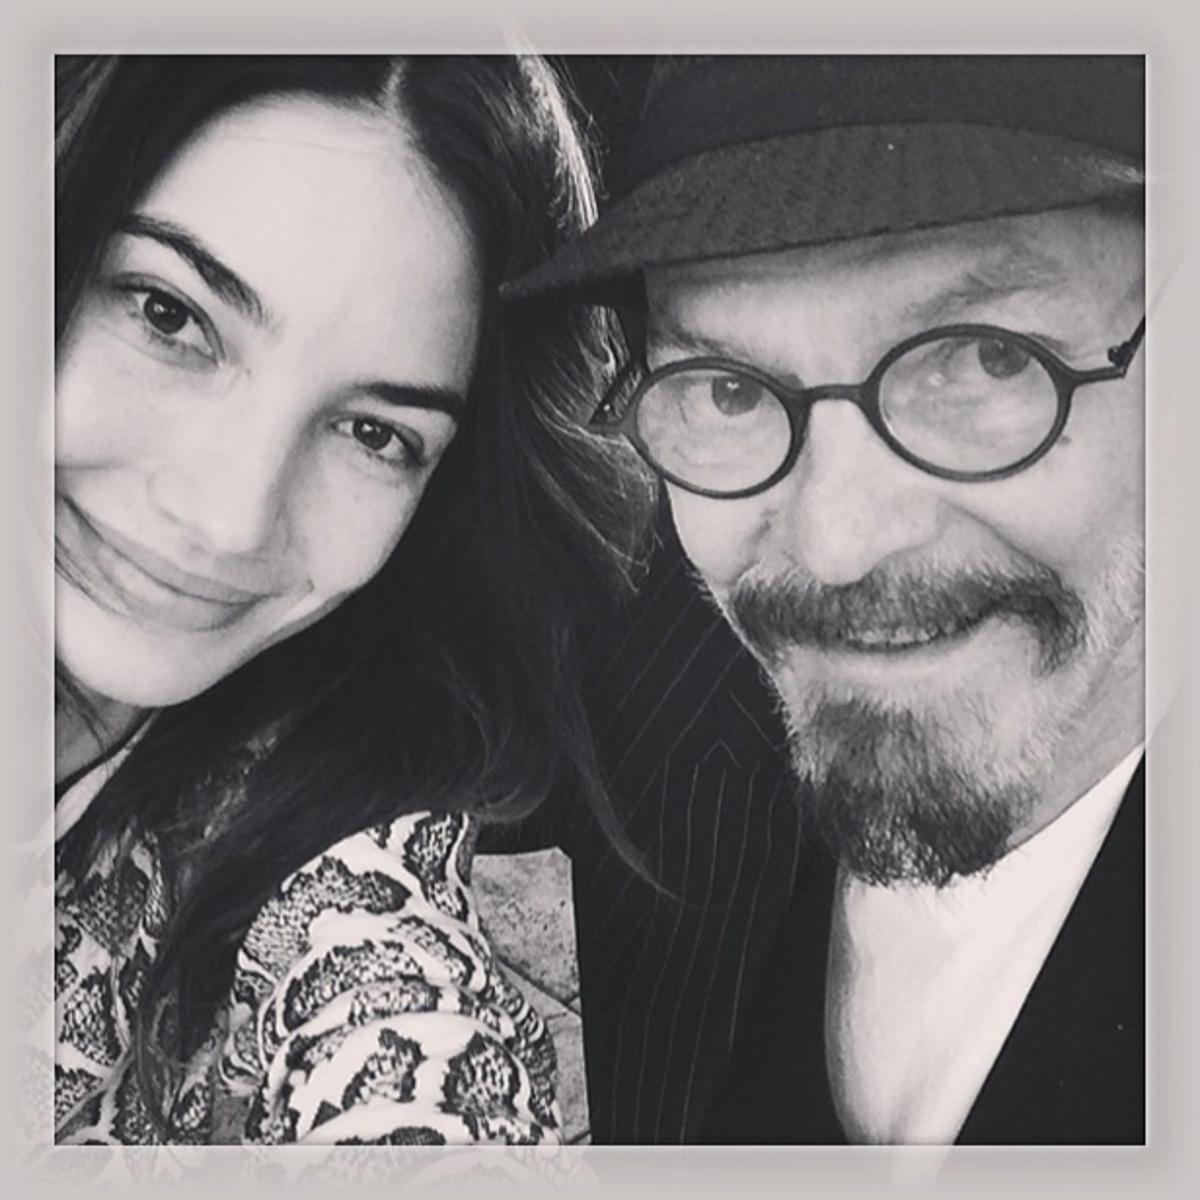 instagram.com/@lilyaldridge